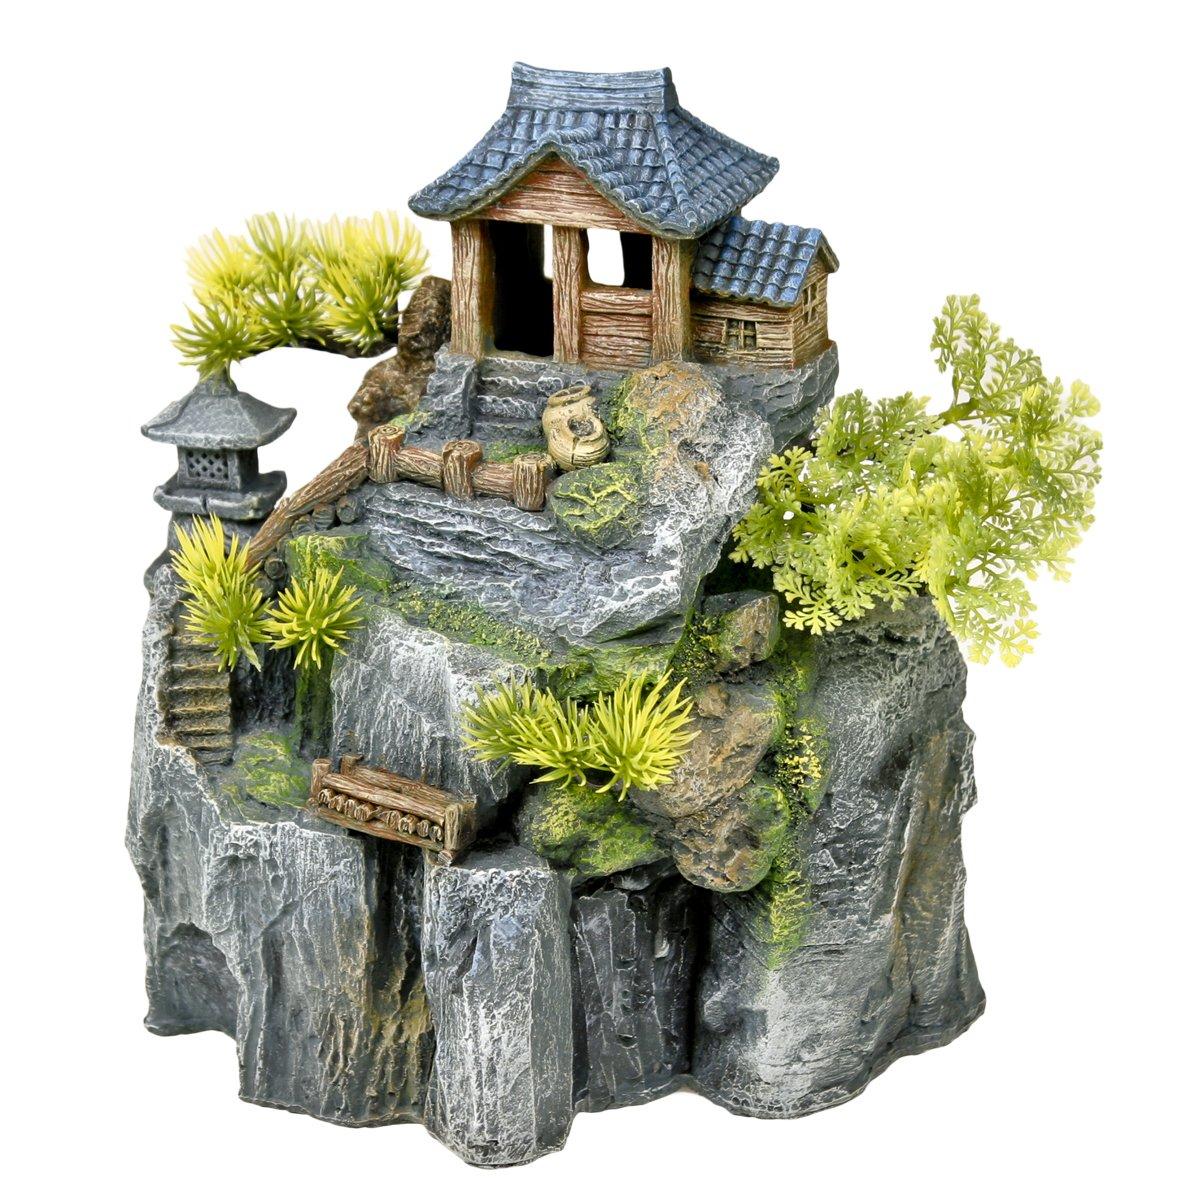 Exotic Environments Asian Cottage House with Bonsai Aquarium Ornament by Blue Ribbon